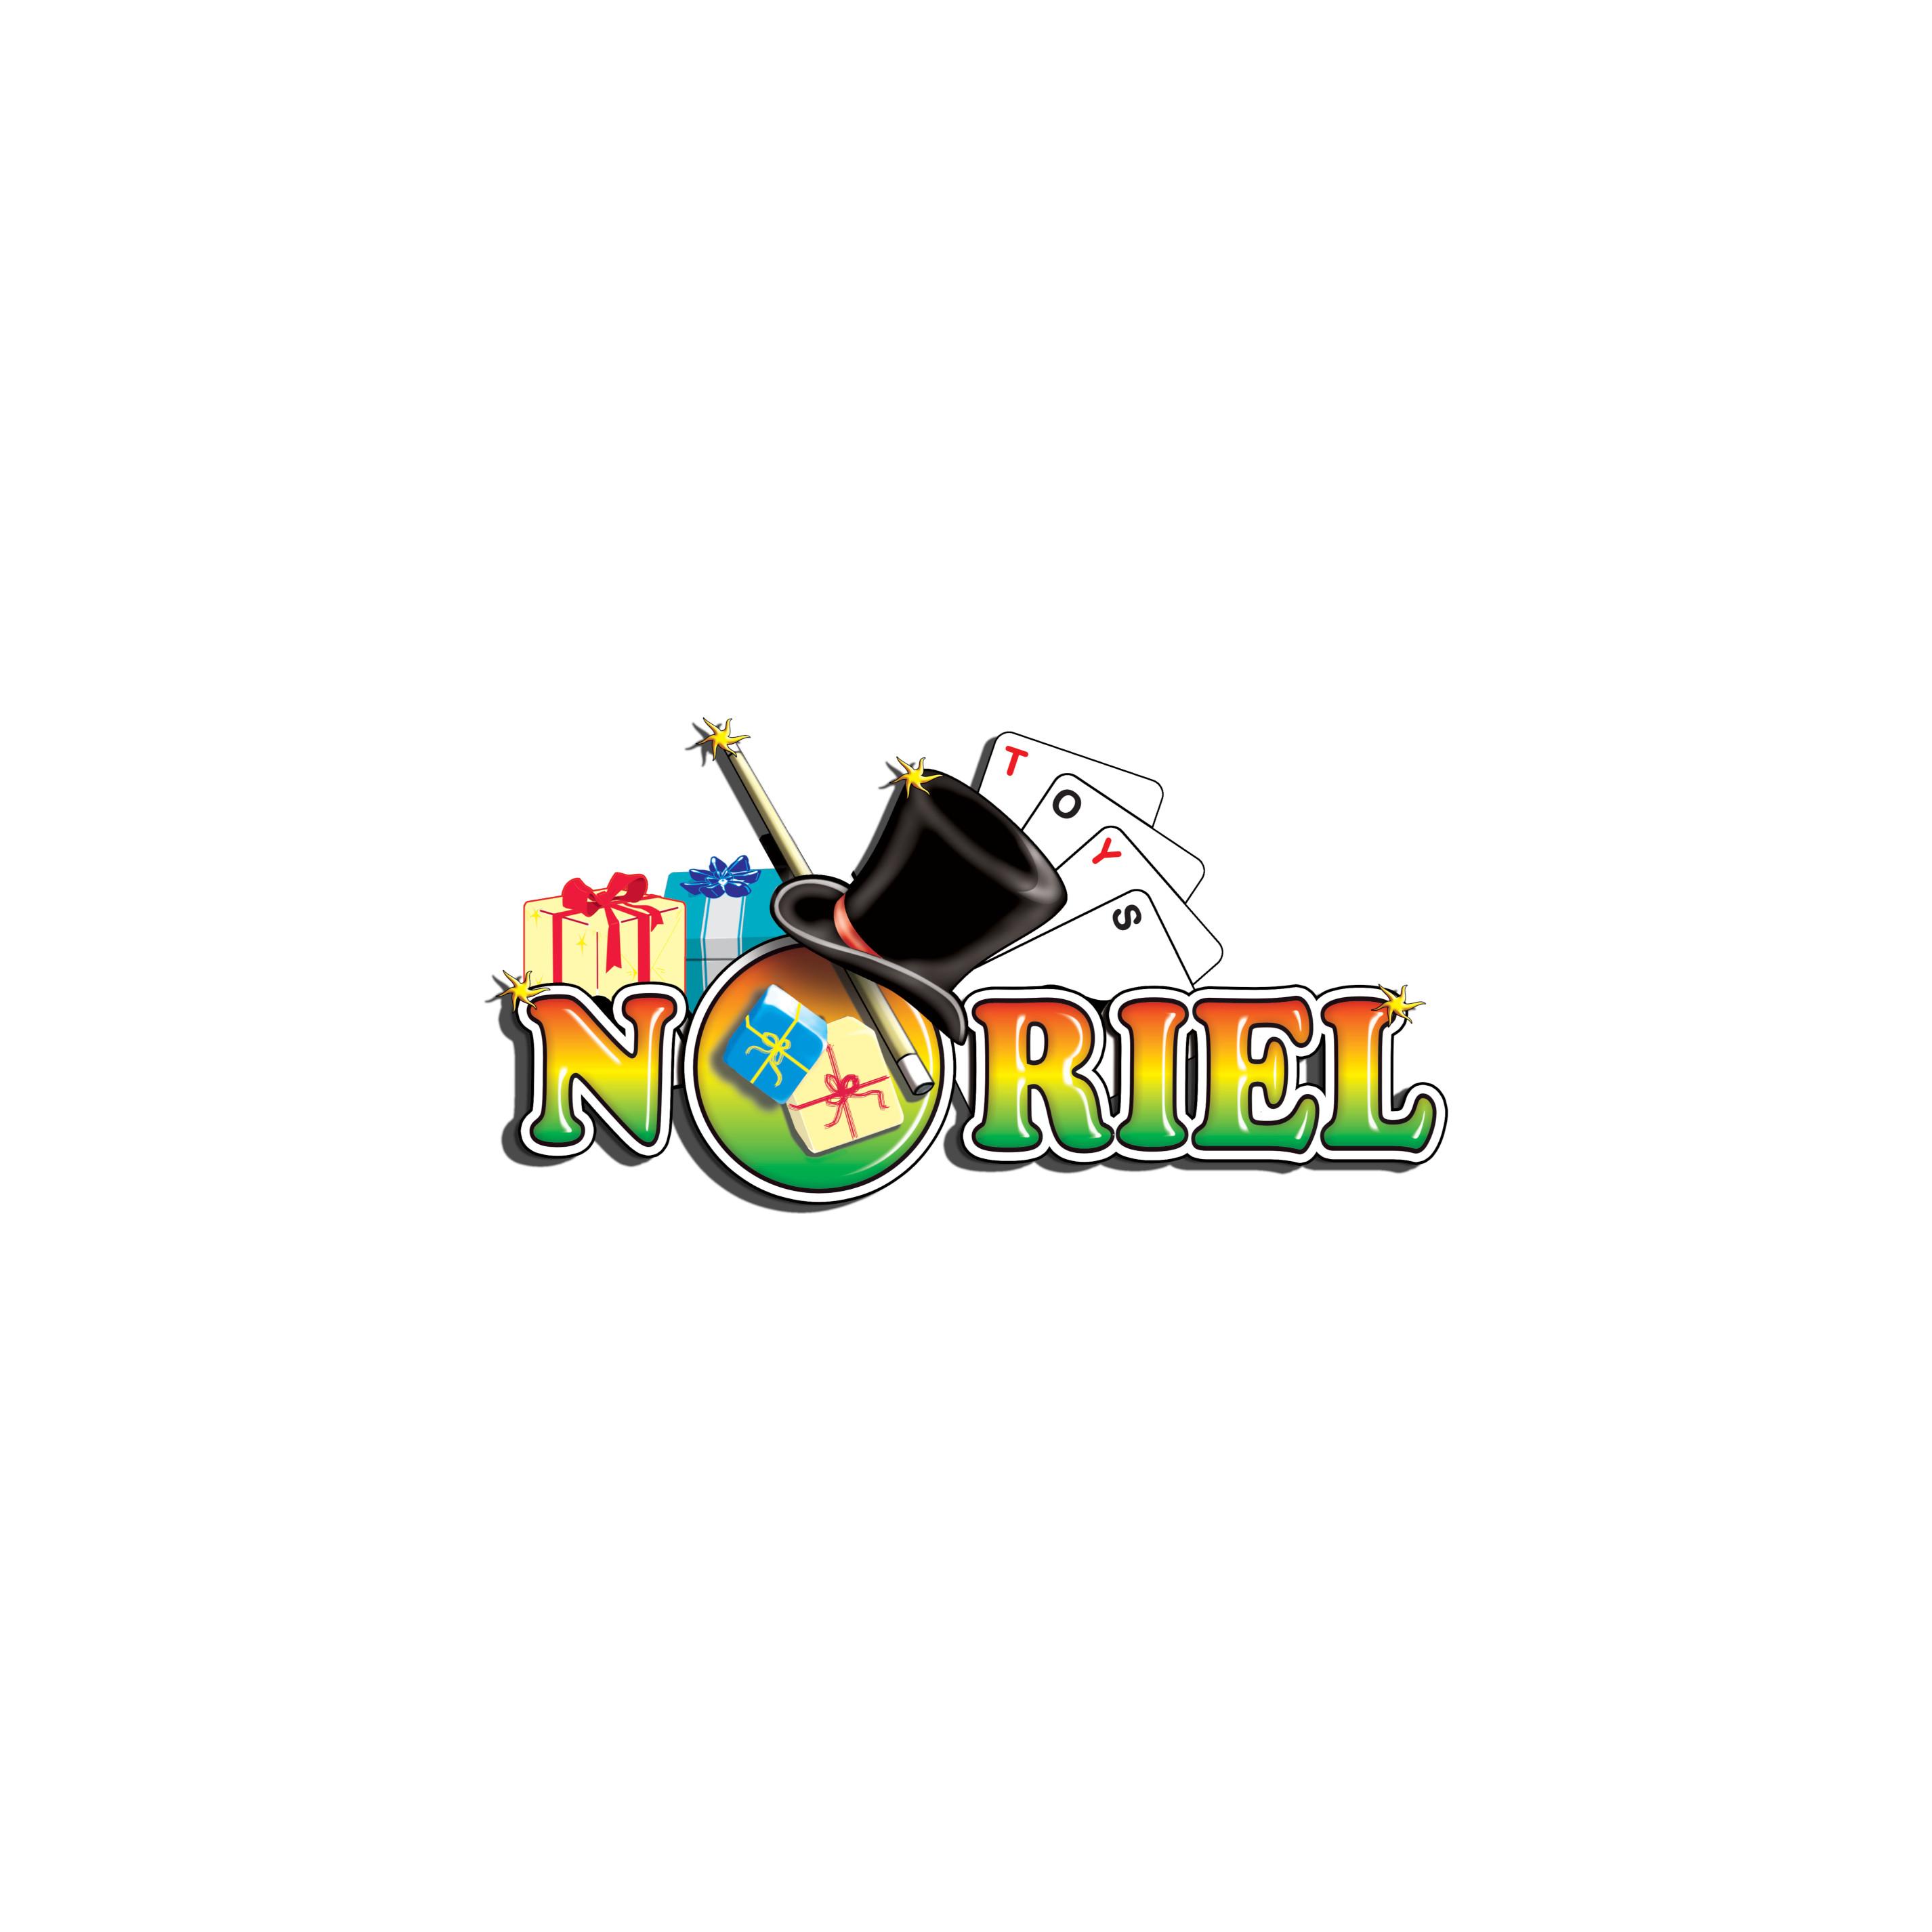 NOR4611_001w Mini Puzzle cu doua fete Noriel - Sat si Oras, 24 piese